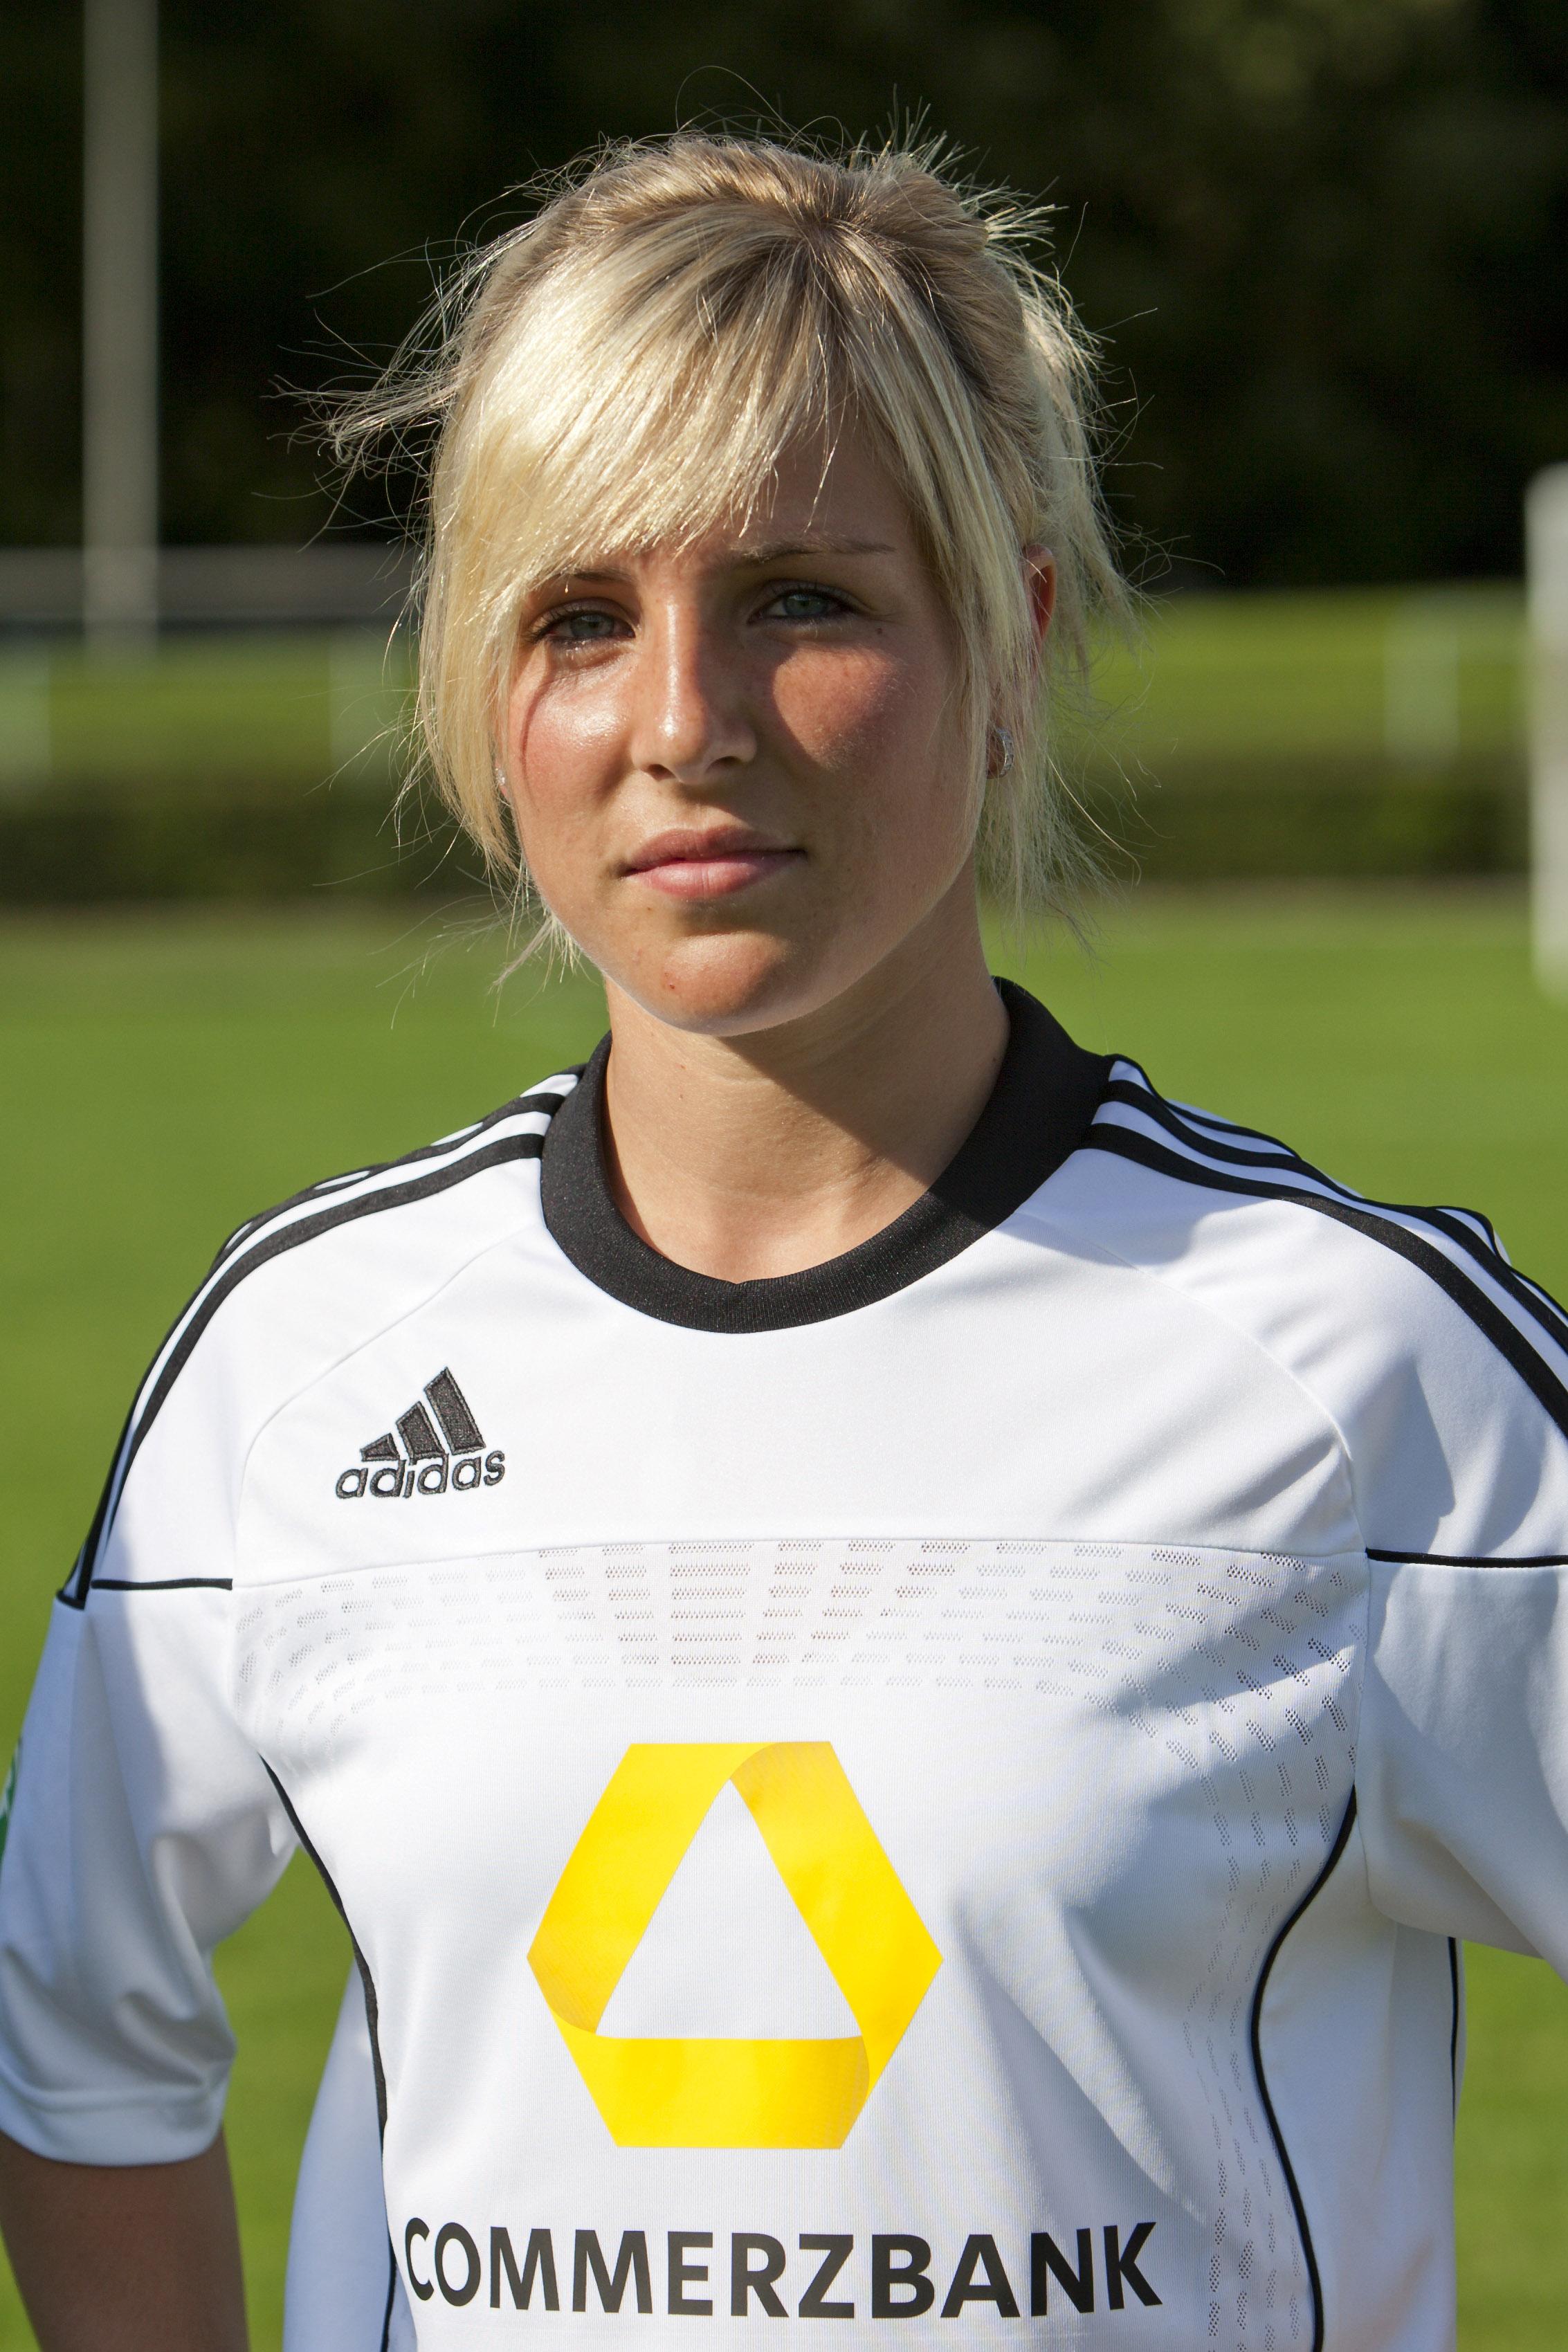 UEFA Womens EURO 2013 | Spurscommunity